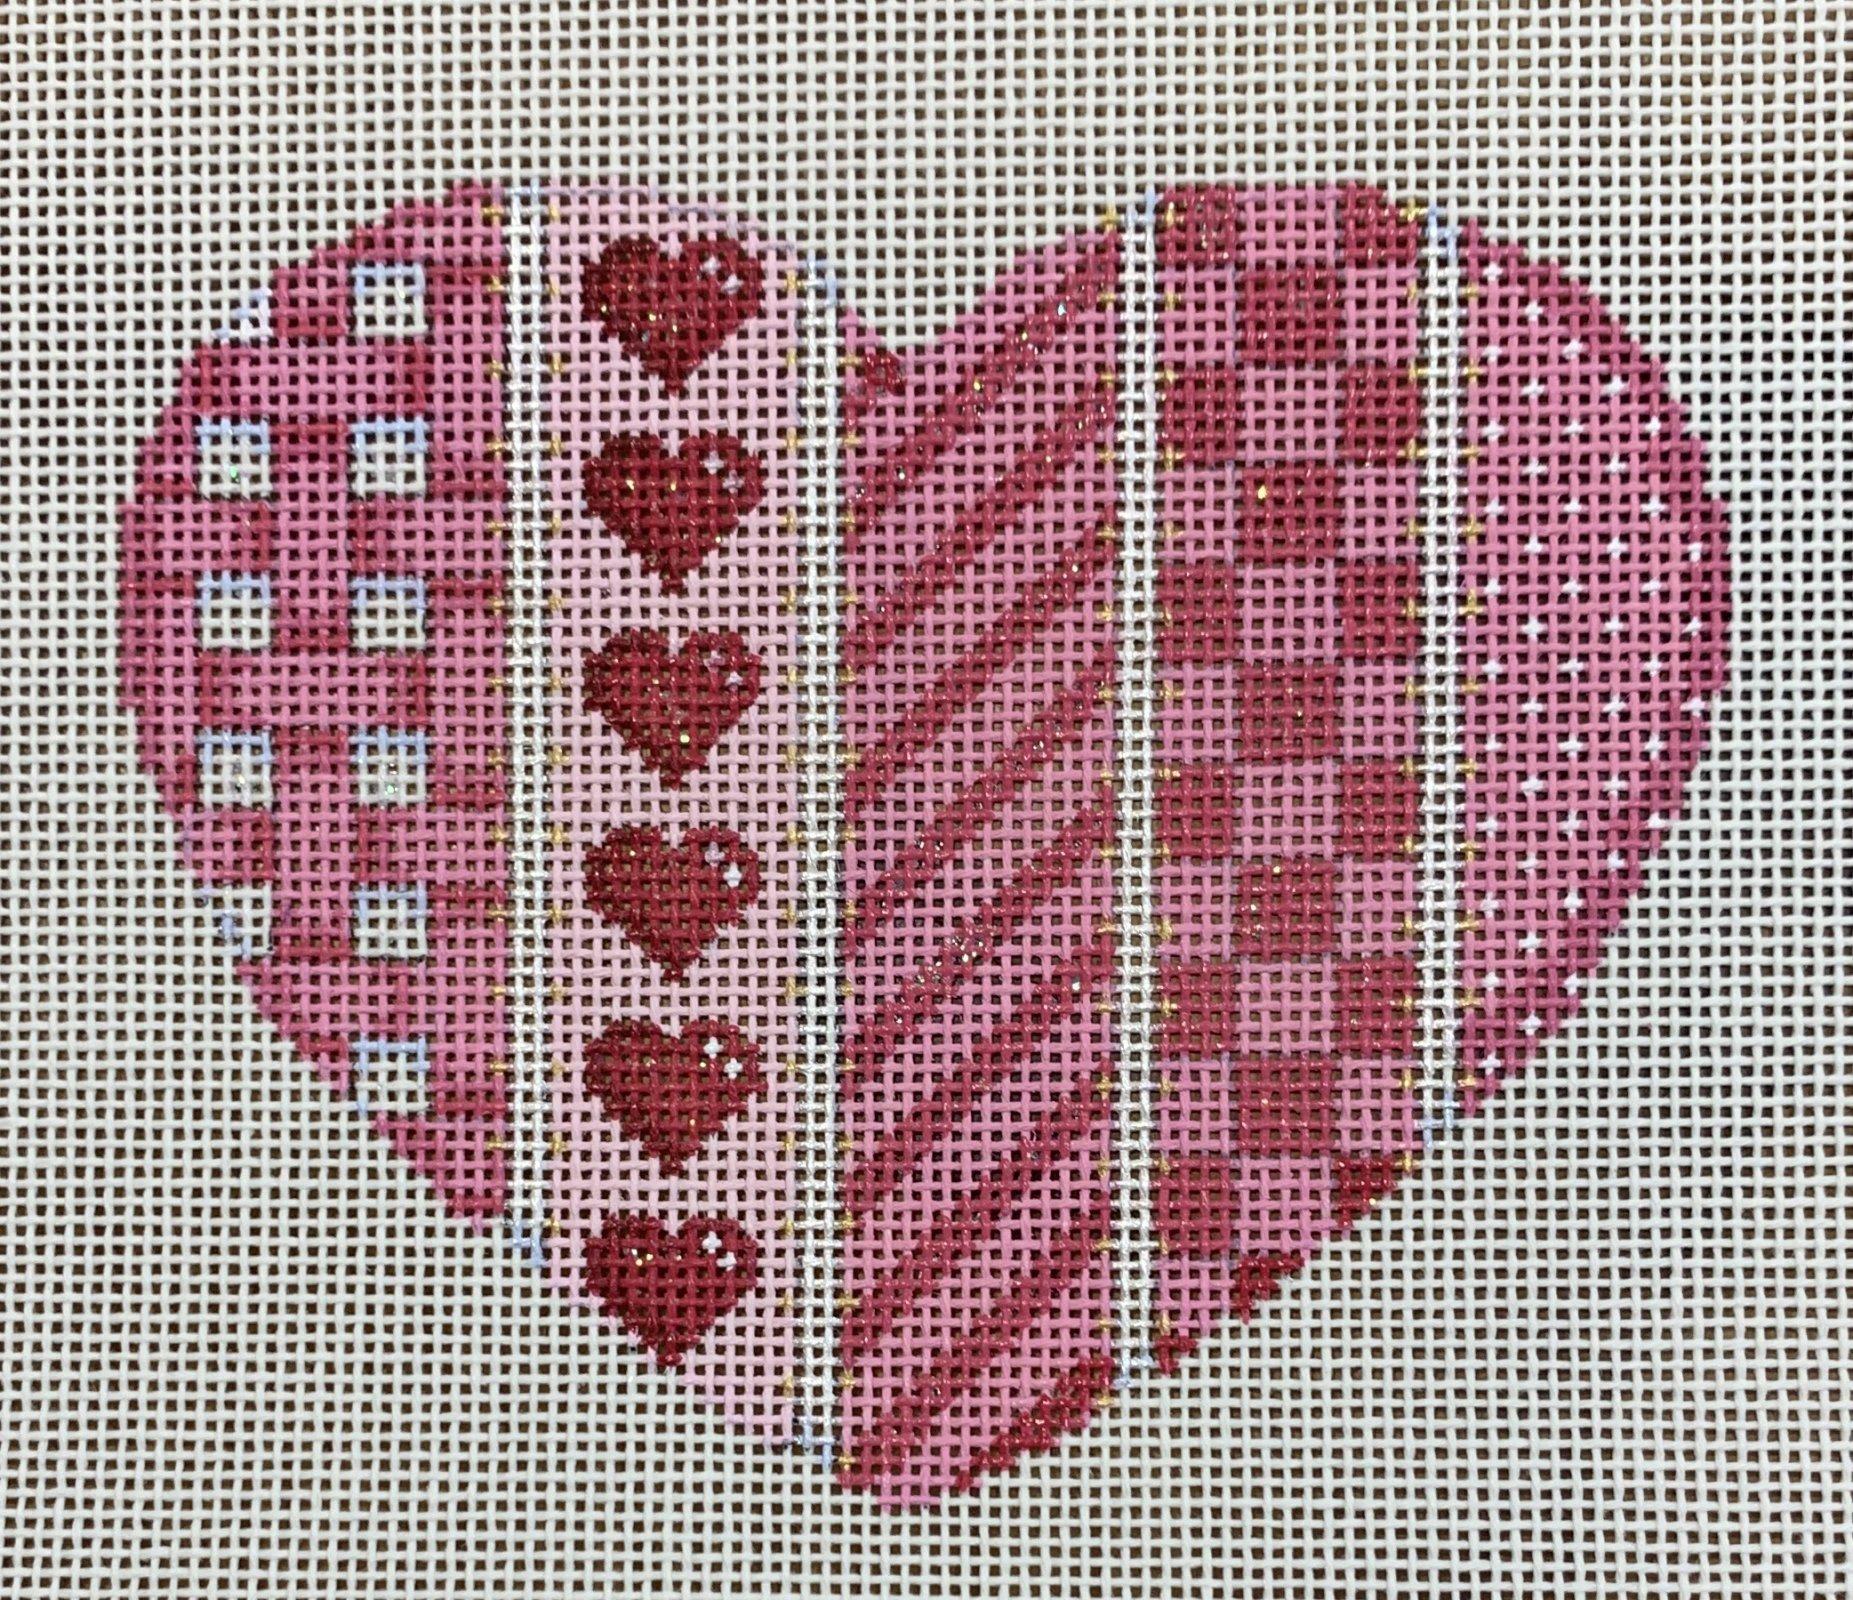 Woven/Hearts/Diag/Checks Lg. Heart